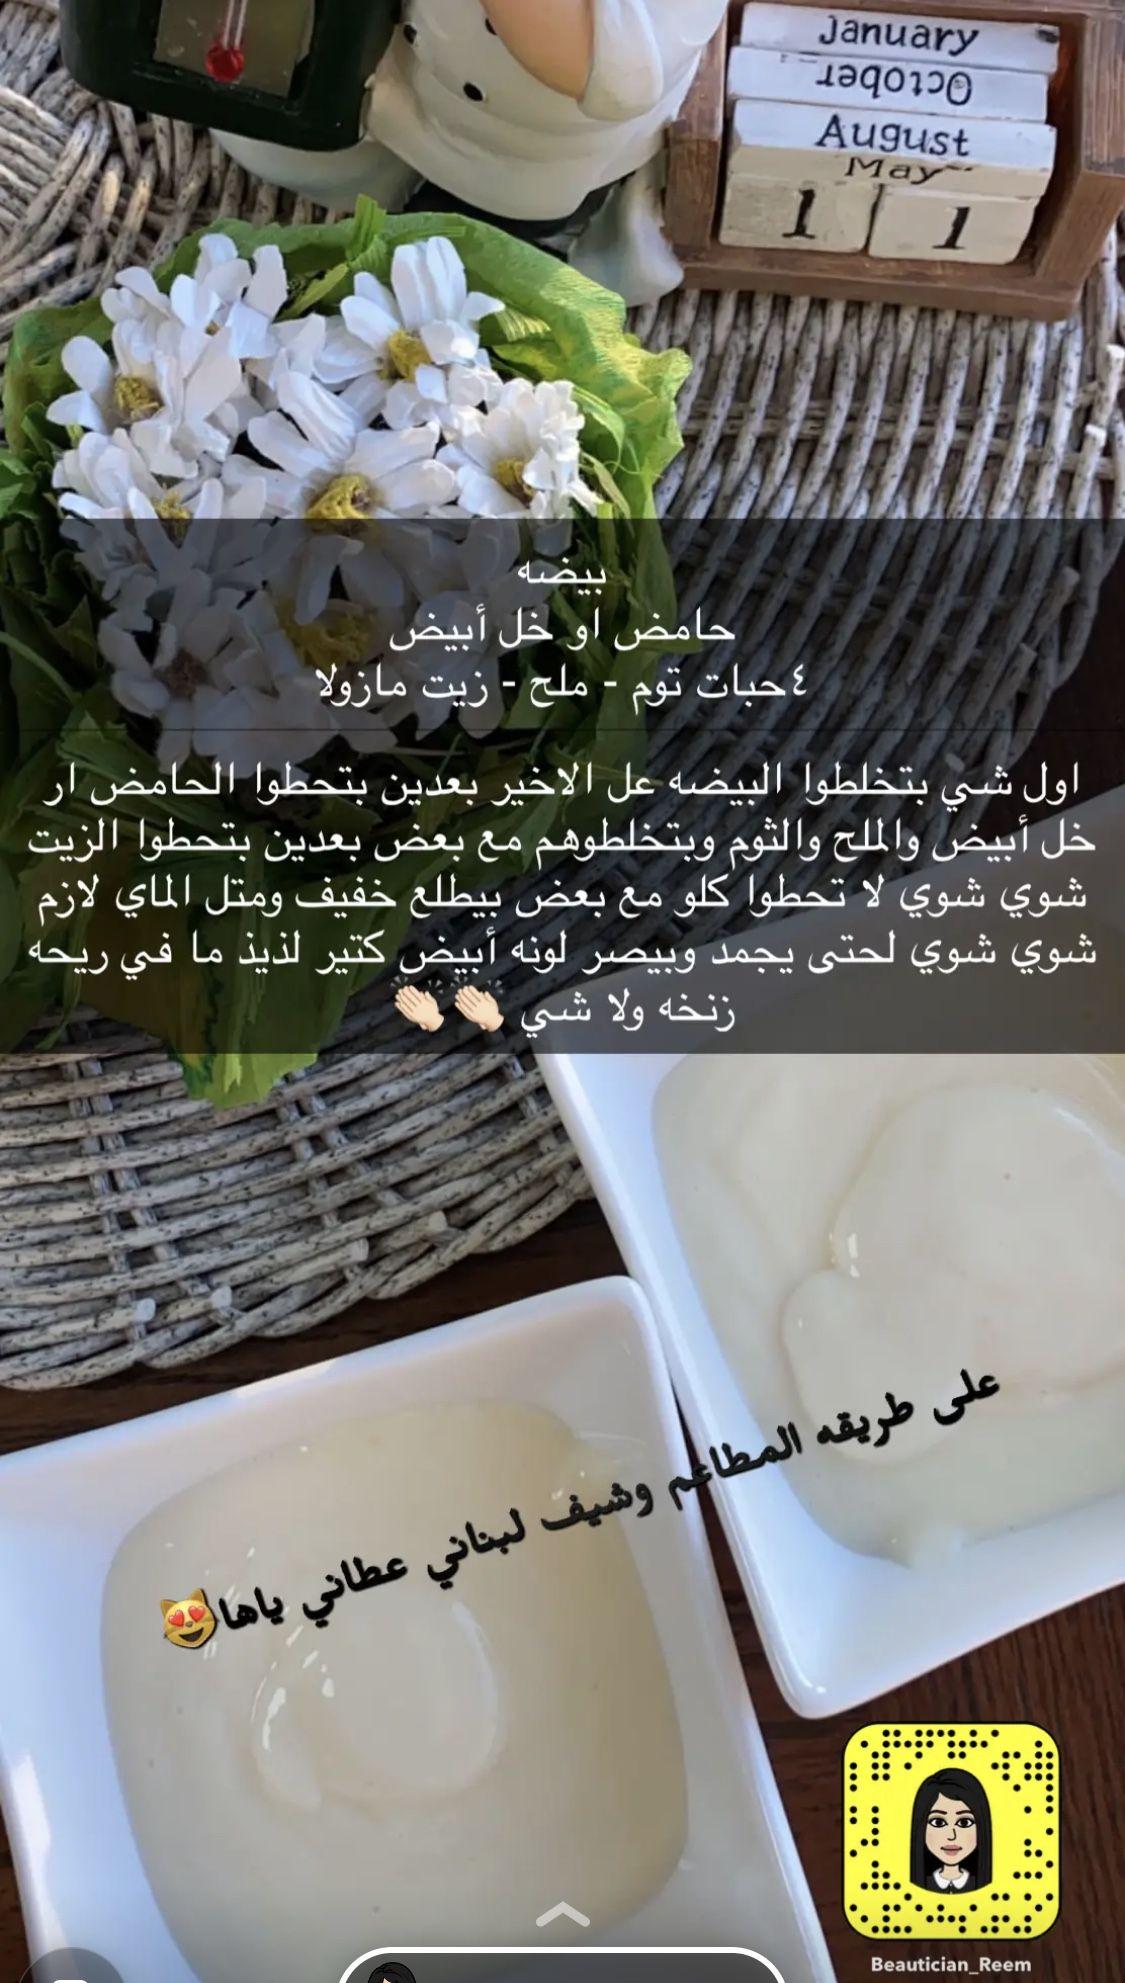 صلصة ثوم Recipes Food Takeout Container